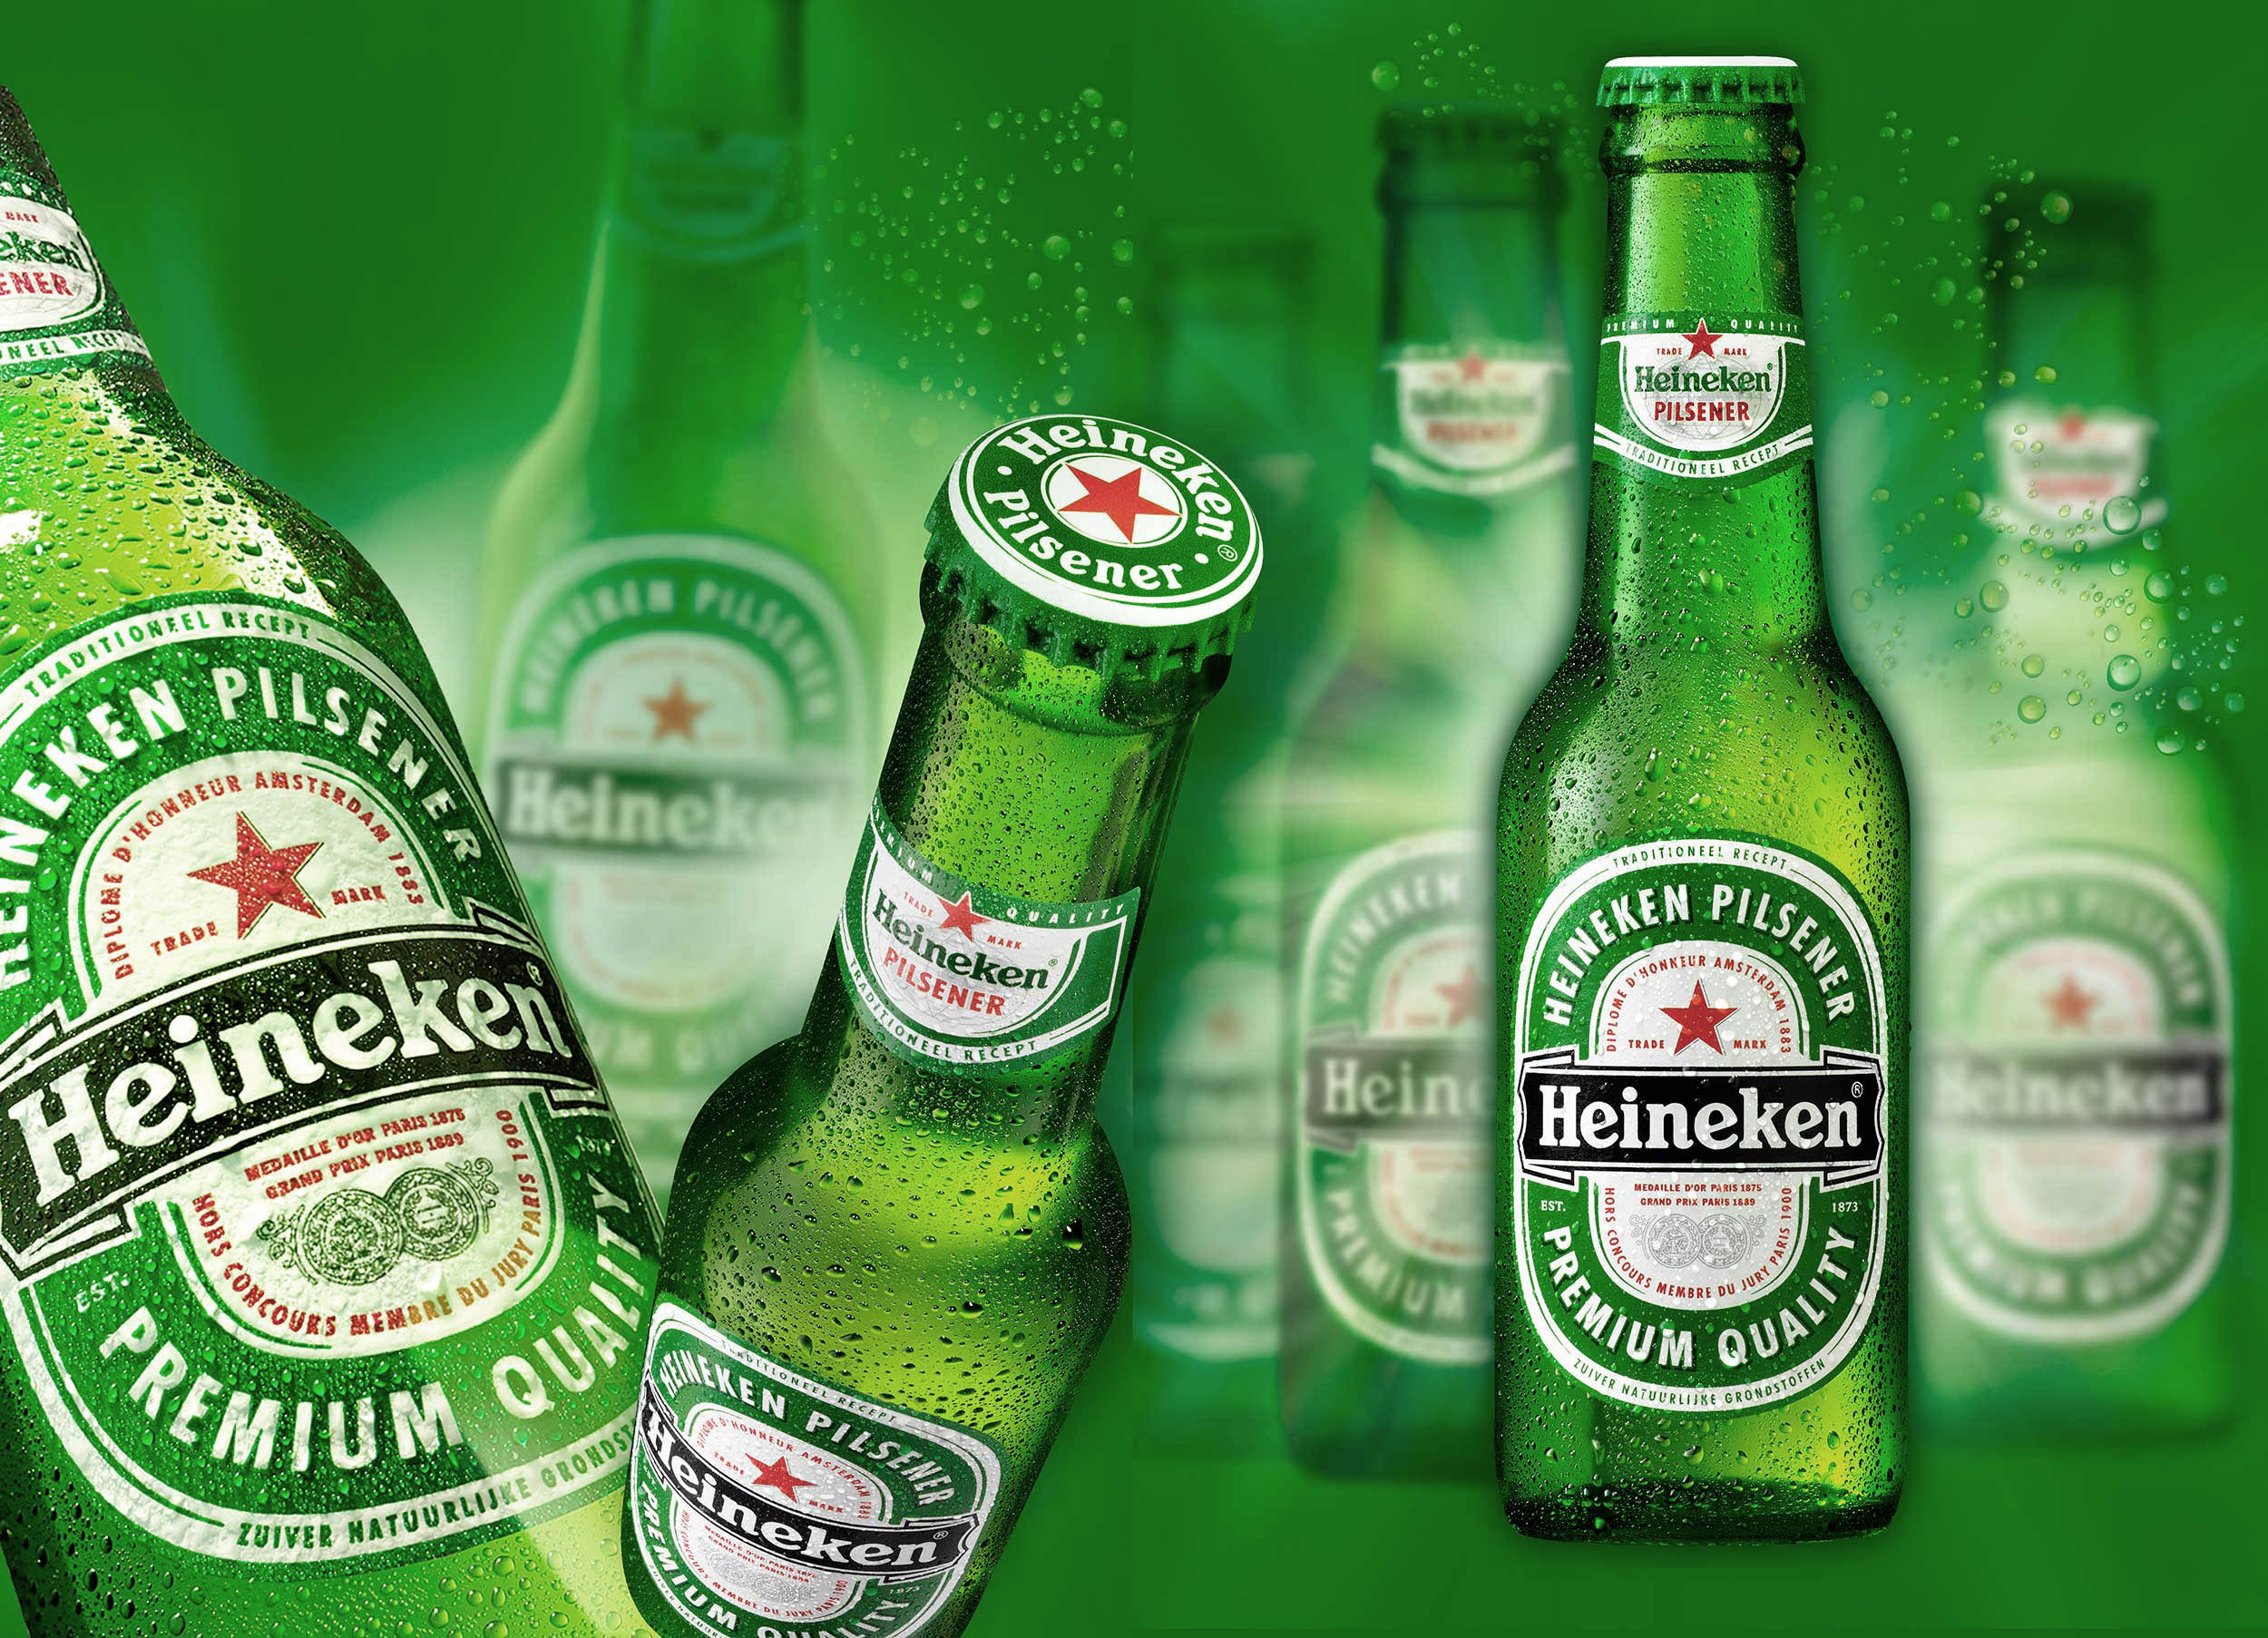 https://crisp.cc/wp-content/uploads/2015/04/Heineken_cpl.jpg